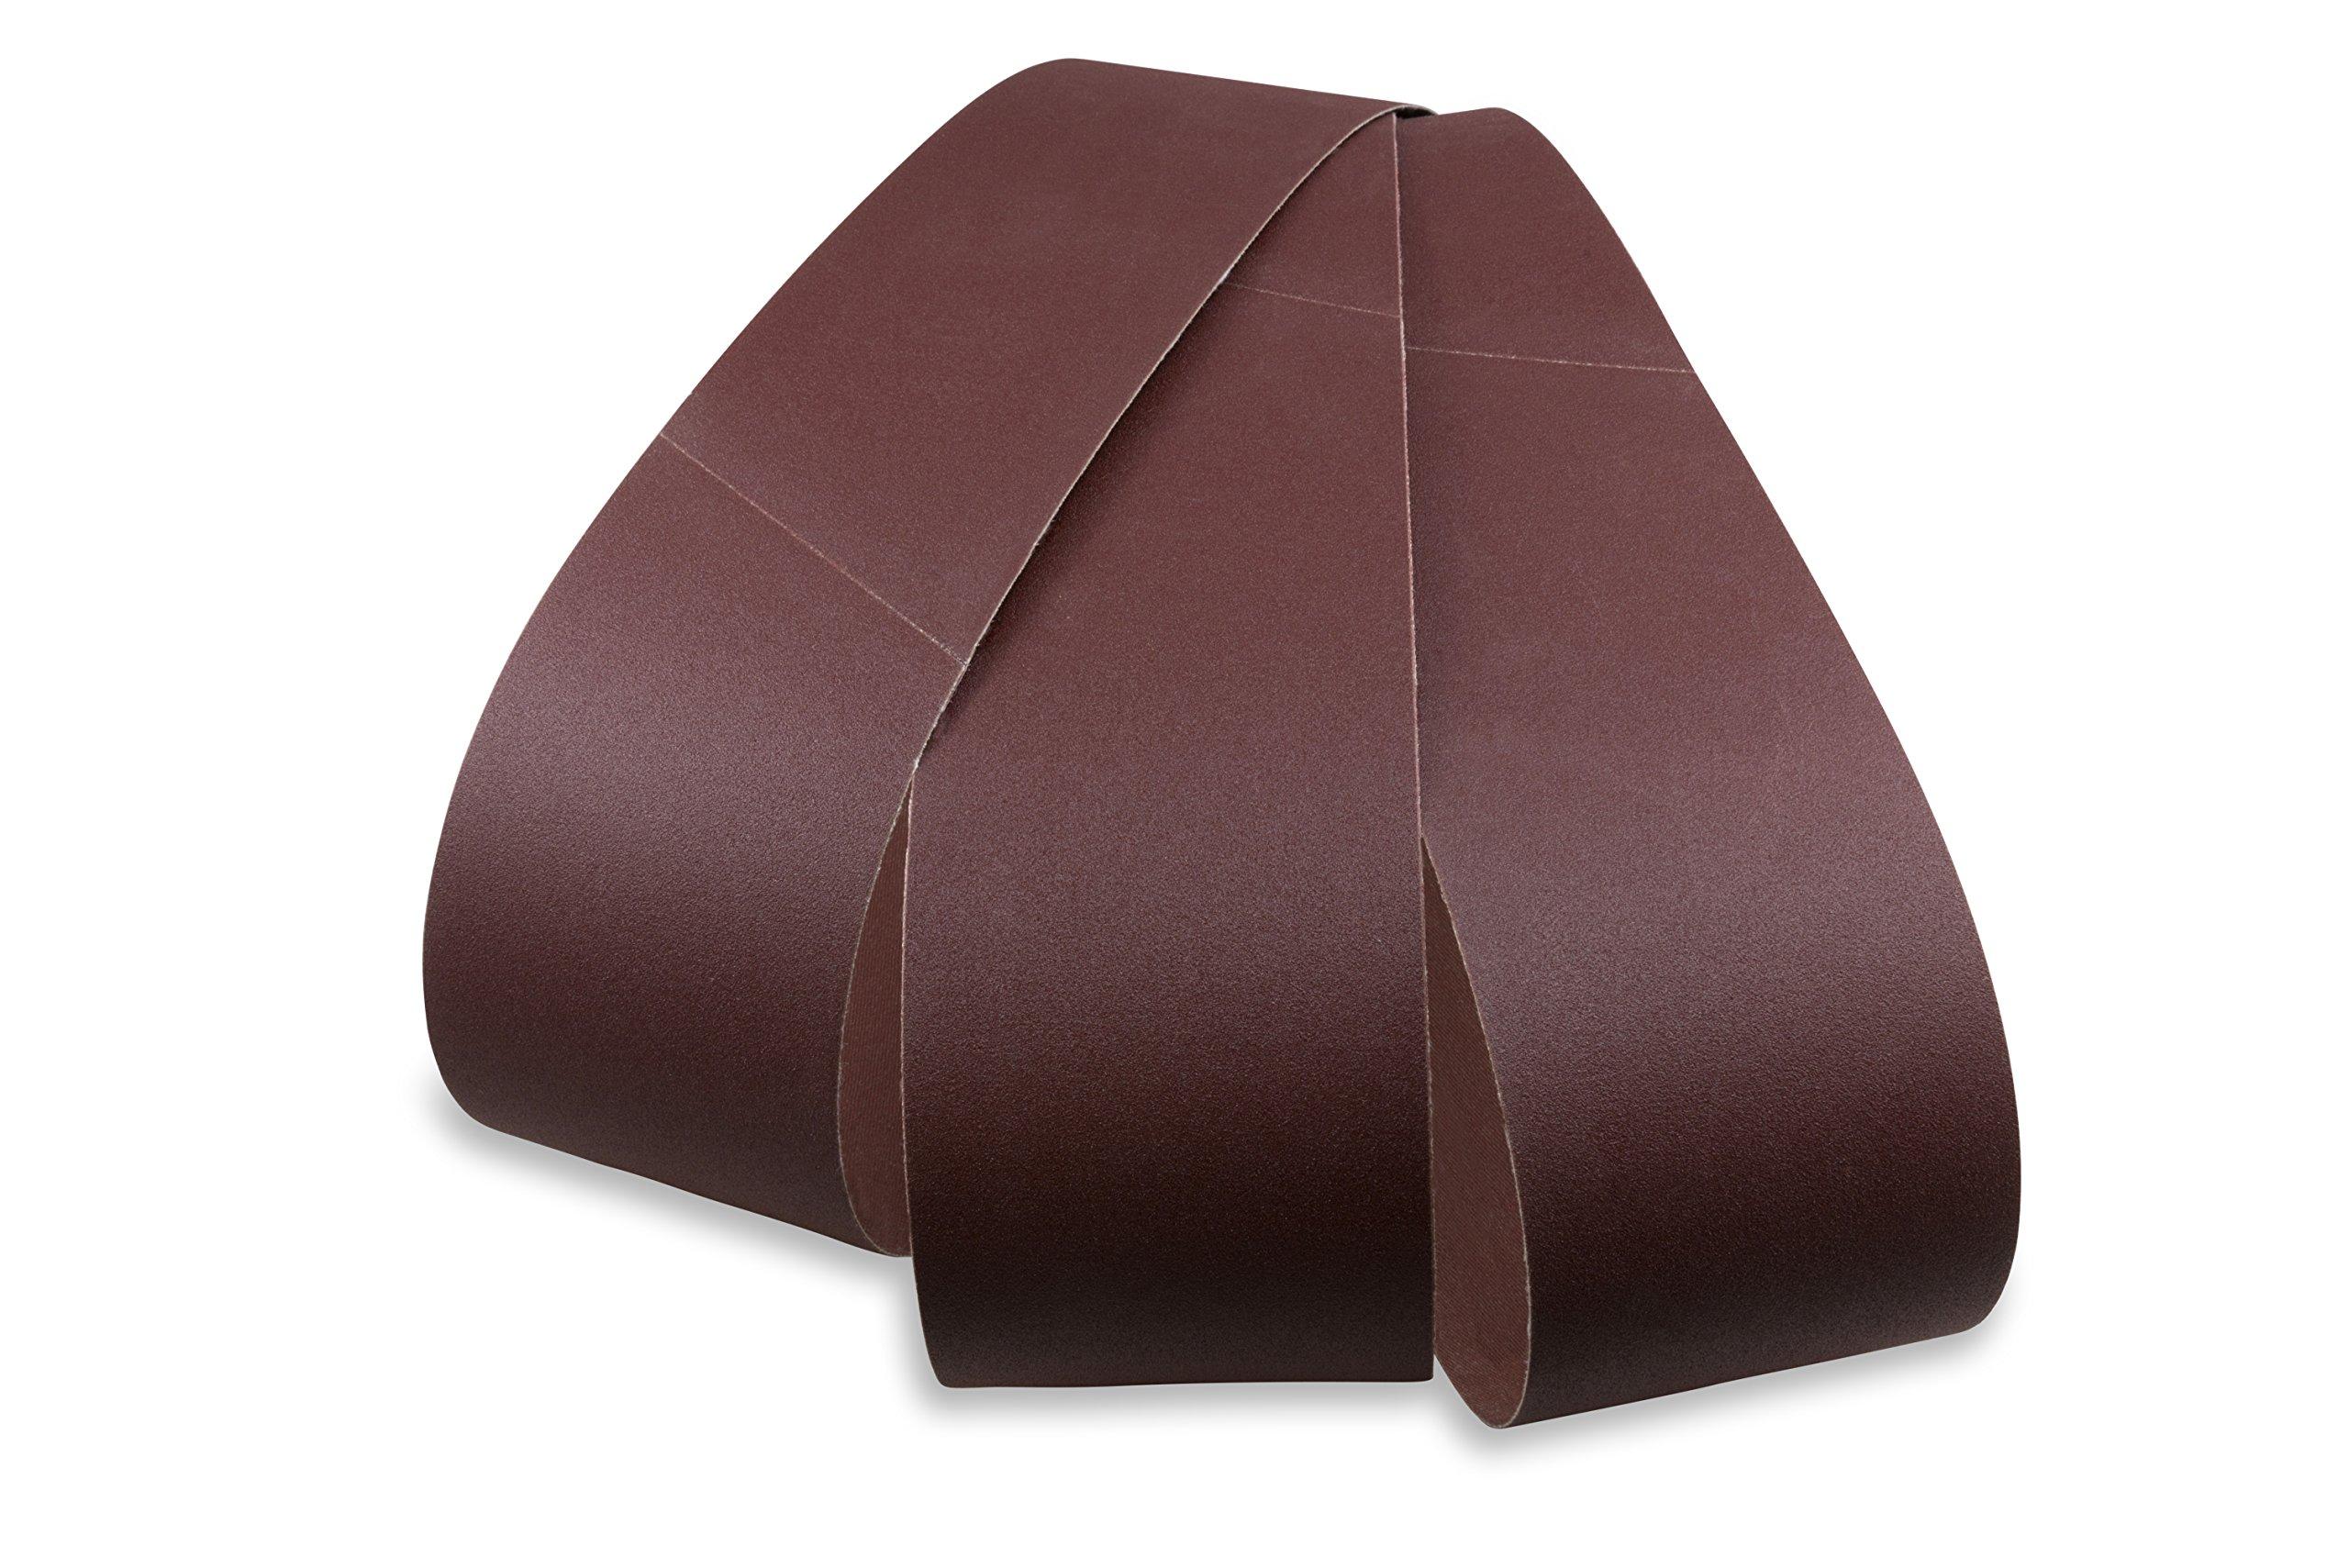 6 X 48 Inch Aluminum Oxide Premium Quality Multipurpose Sanding Belts 120, 180, 220 Grit, 3 Pack Assortment